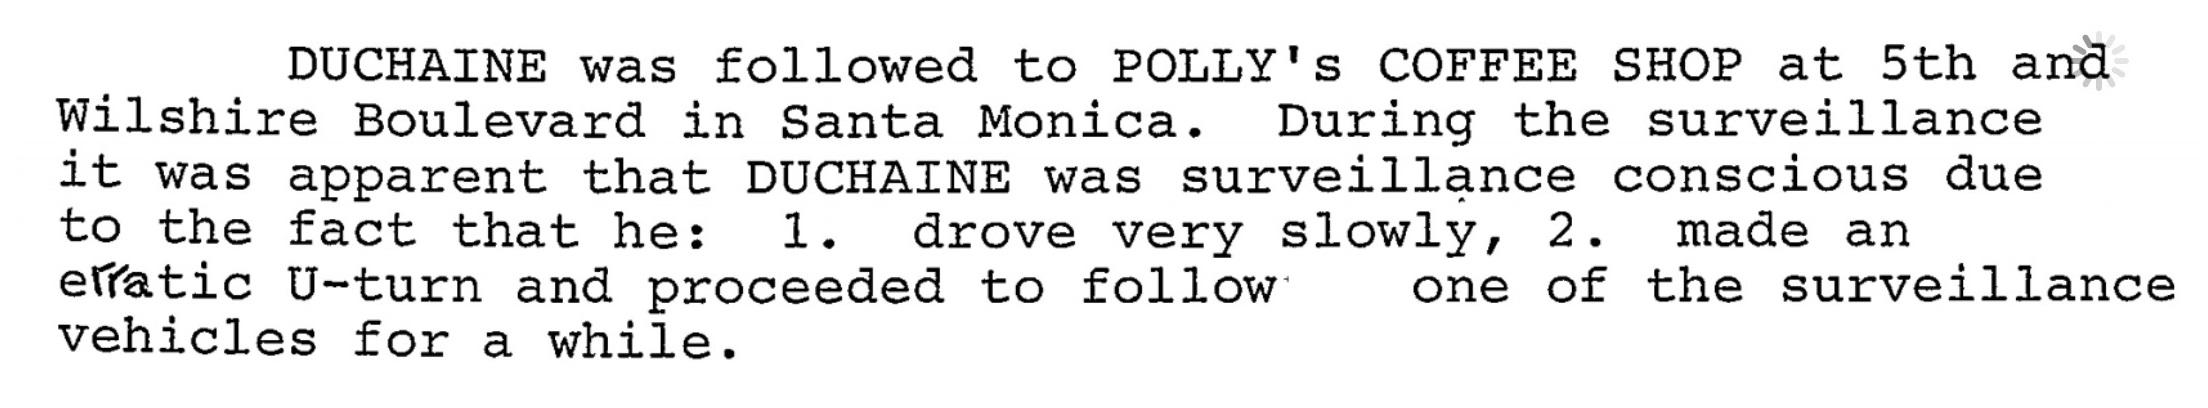 El archivo del FBI sobre el polémico gurú de esteroides Daniel Duchaine Erratic